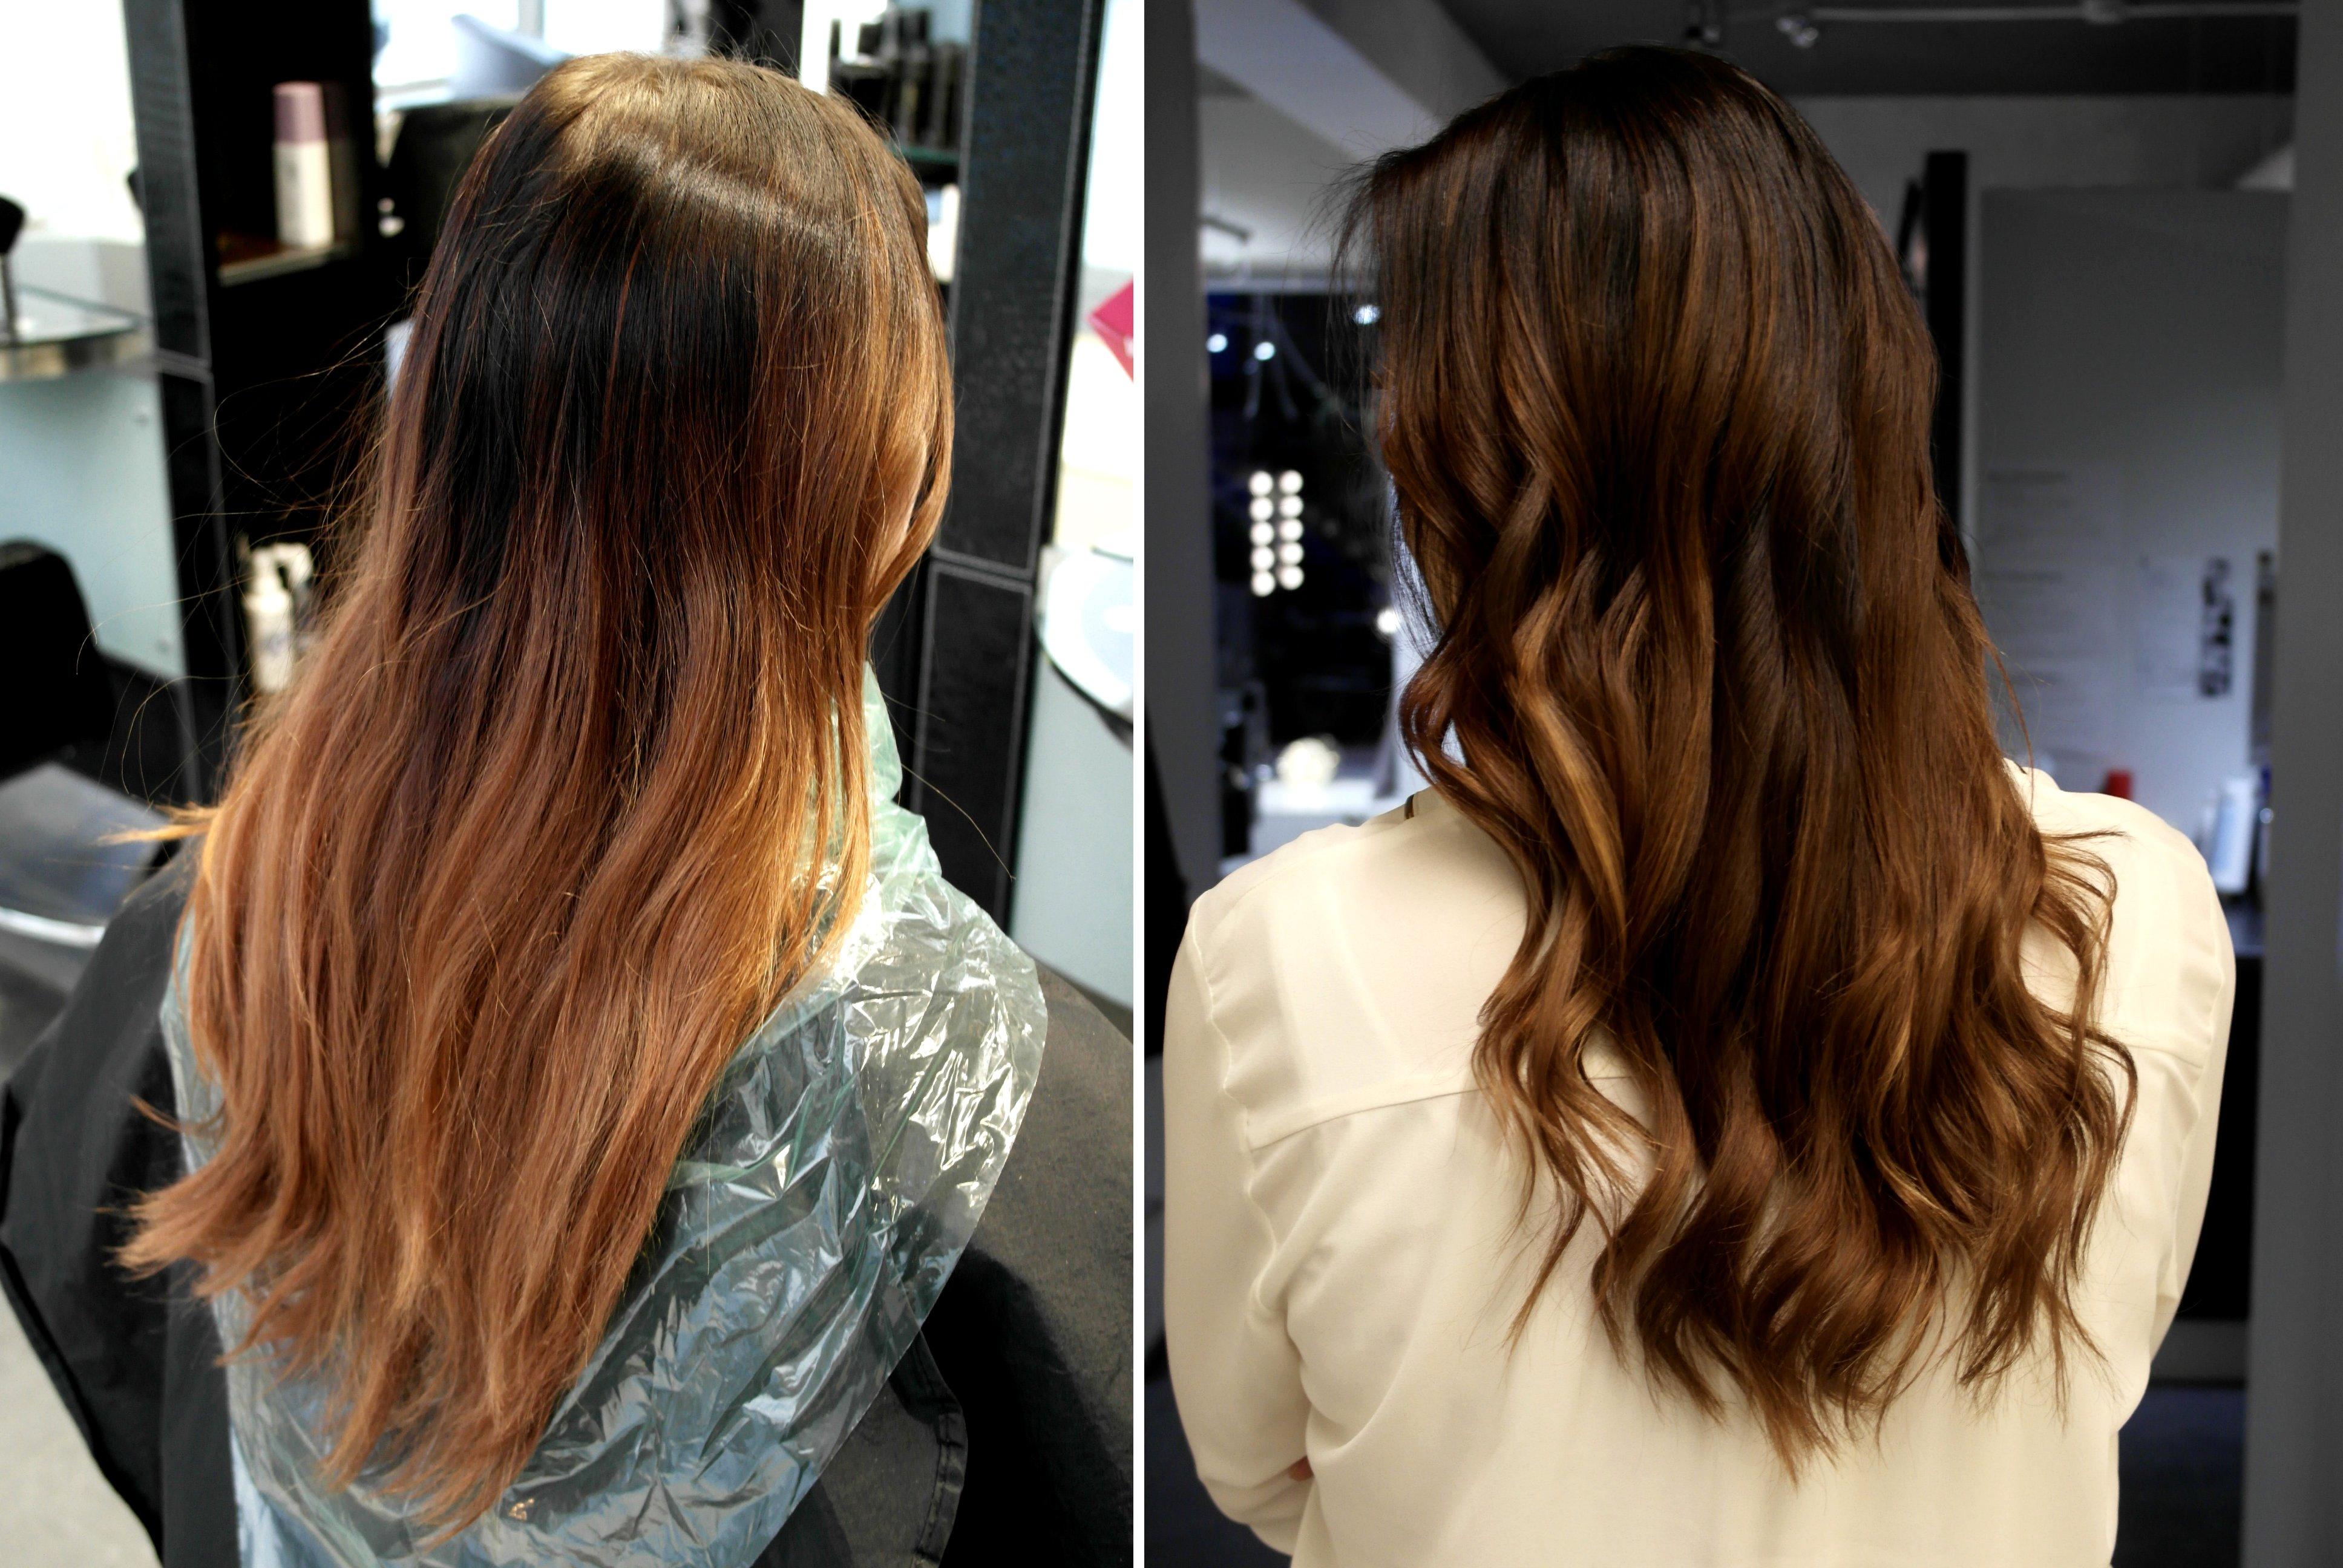 Tanian tukka